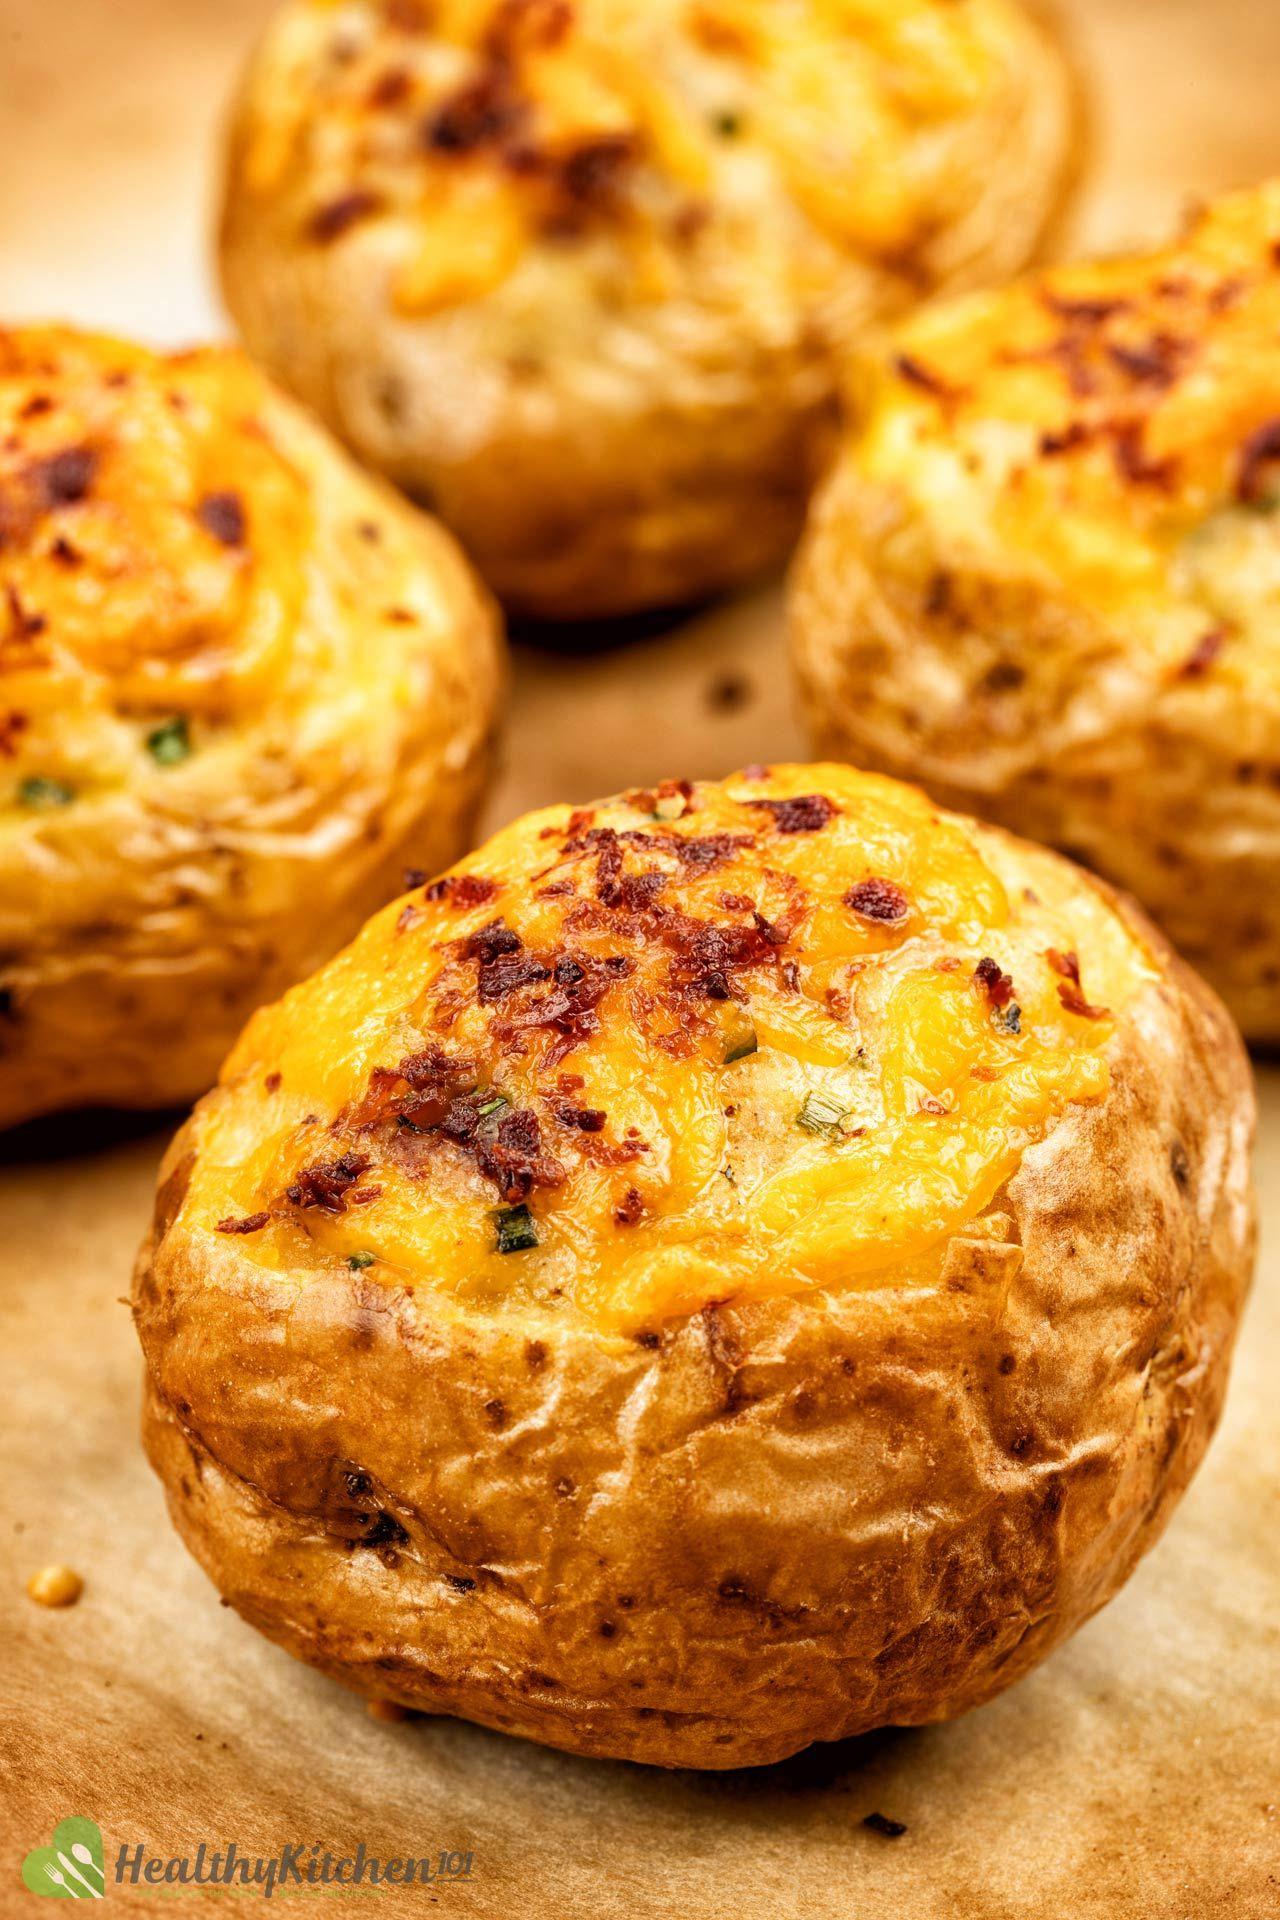 Homemade Baked Potatoes Recipe